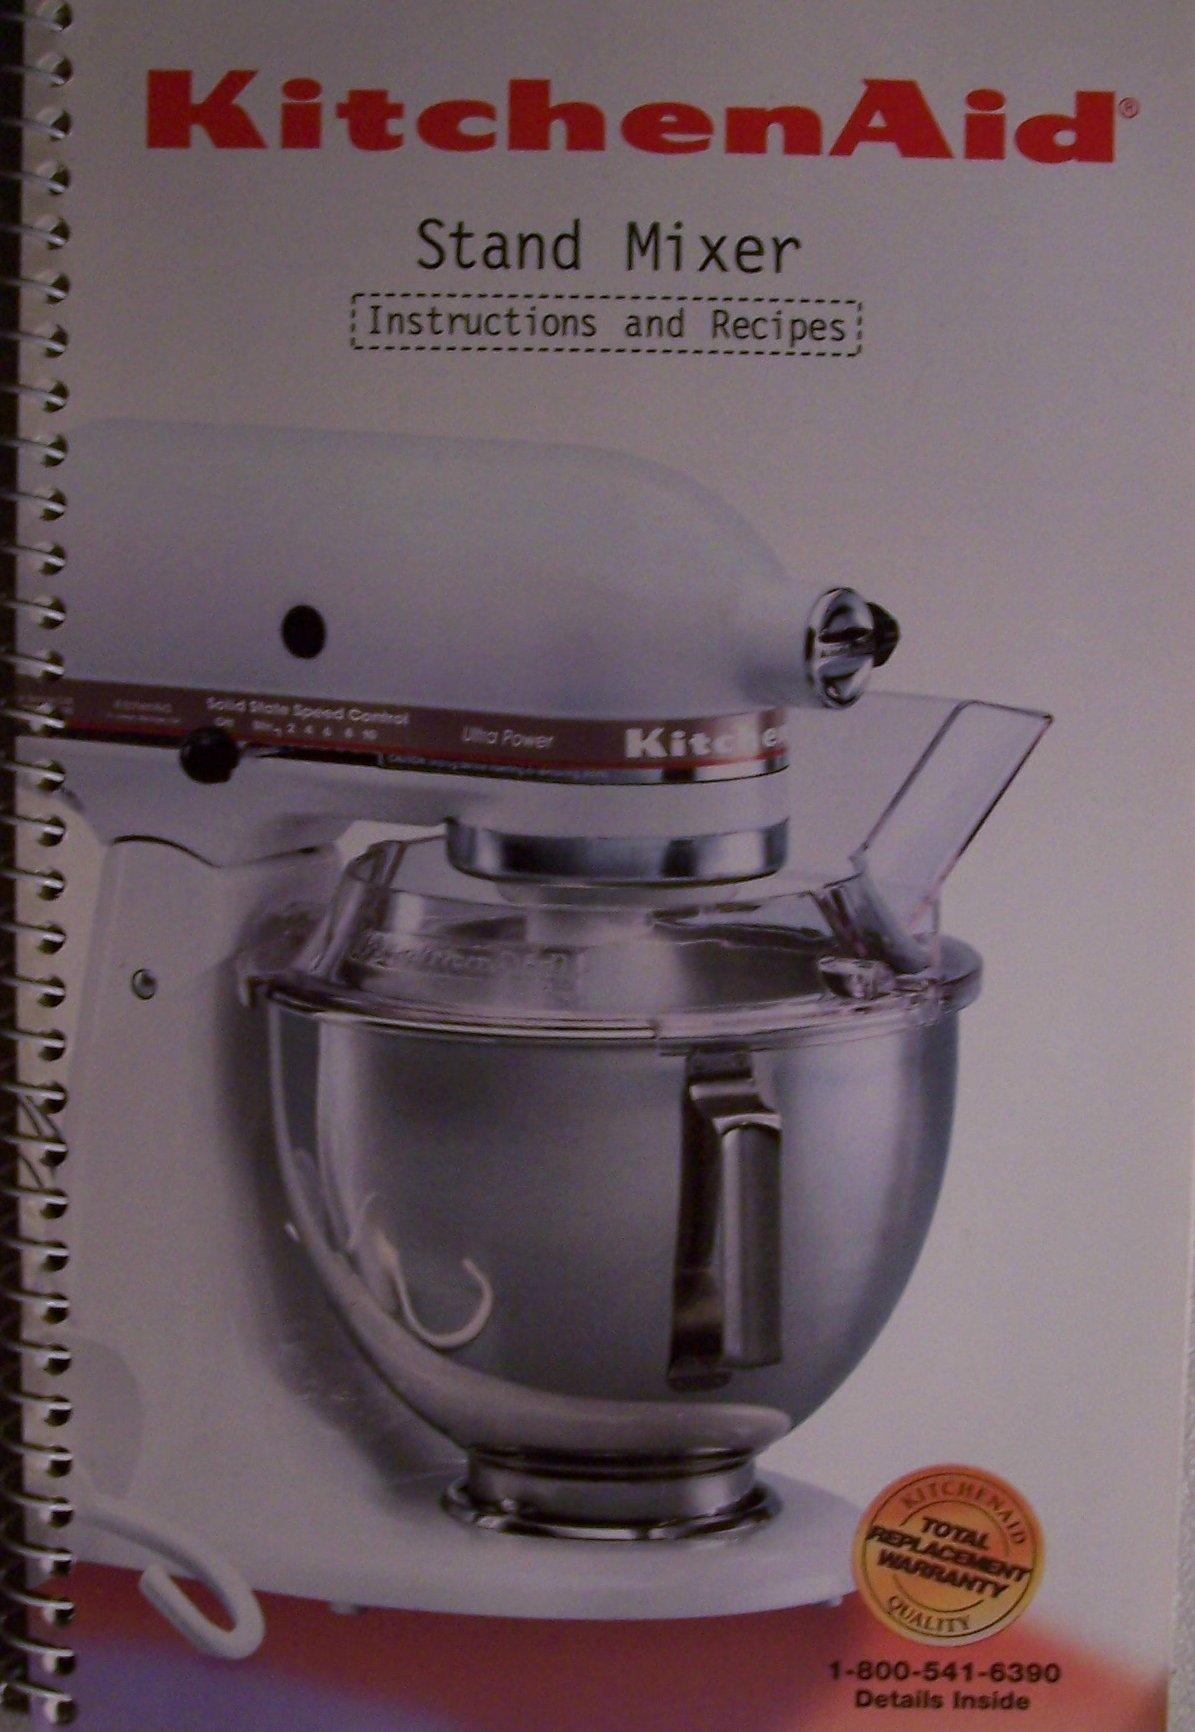 kitchenaid stand mixer instructions and recipes 9704323 rev a rh amazon com kitchenaid artisan mixer instruction book kitchenaid professional hd stand mixer instruction manual